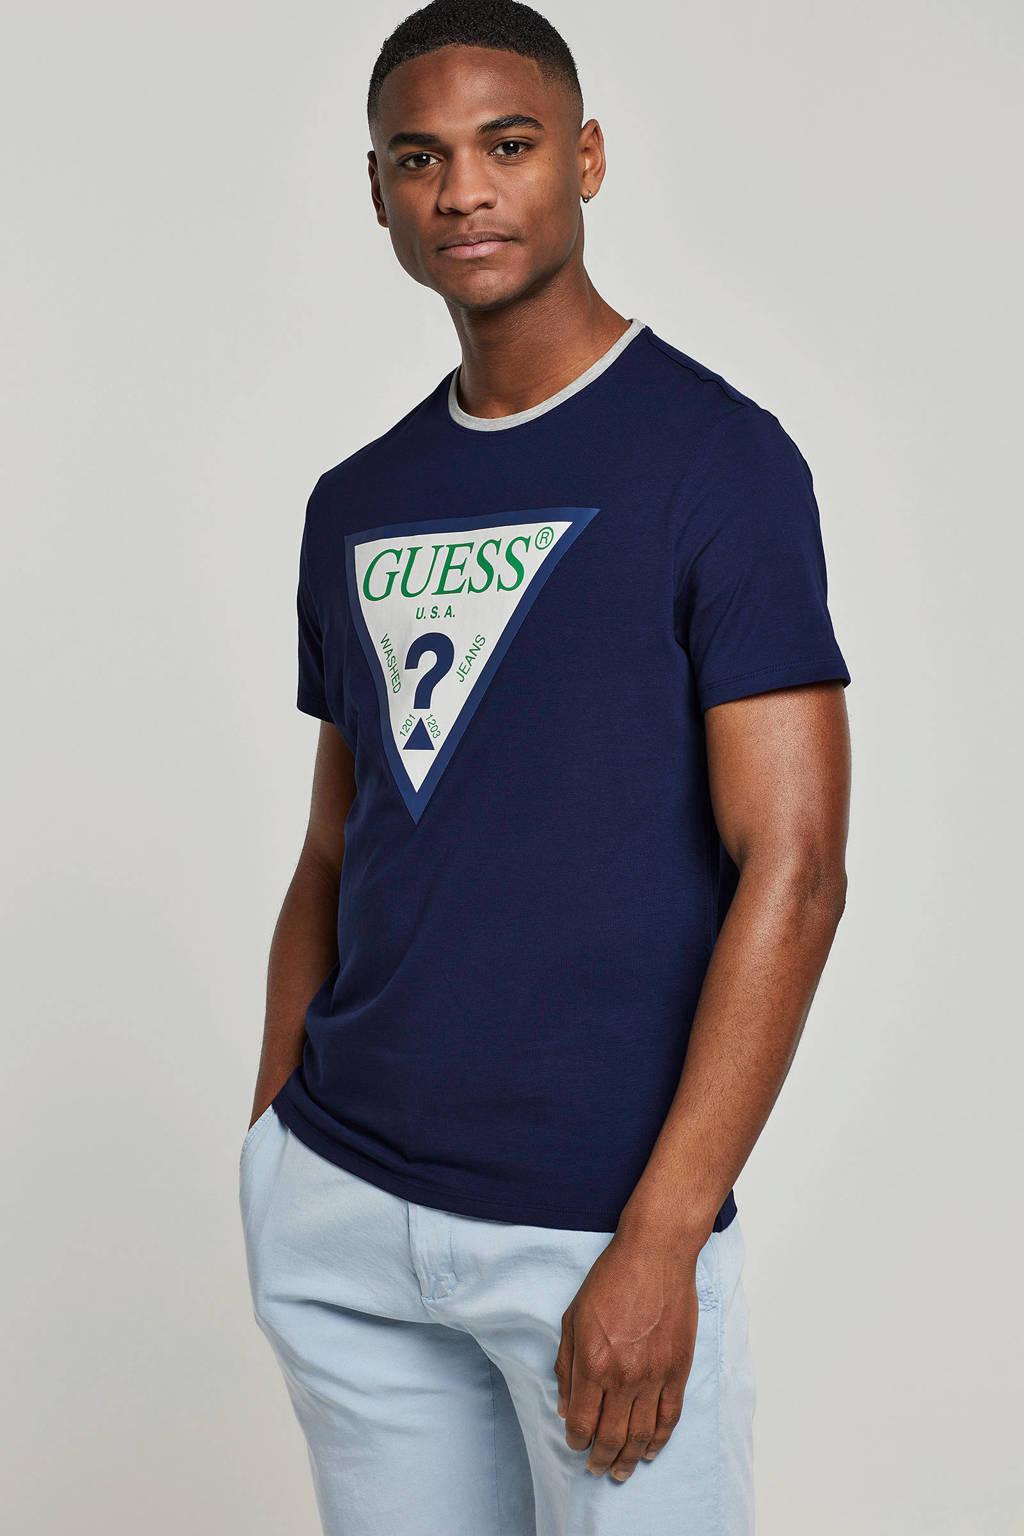 GUESS T-shirt met logo blauw, Blauw